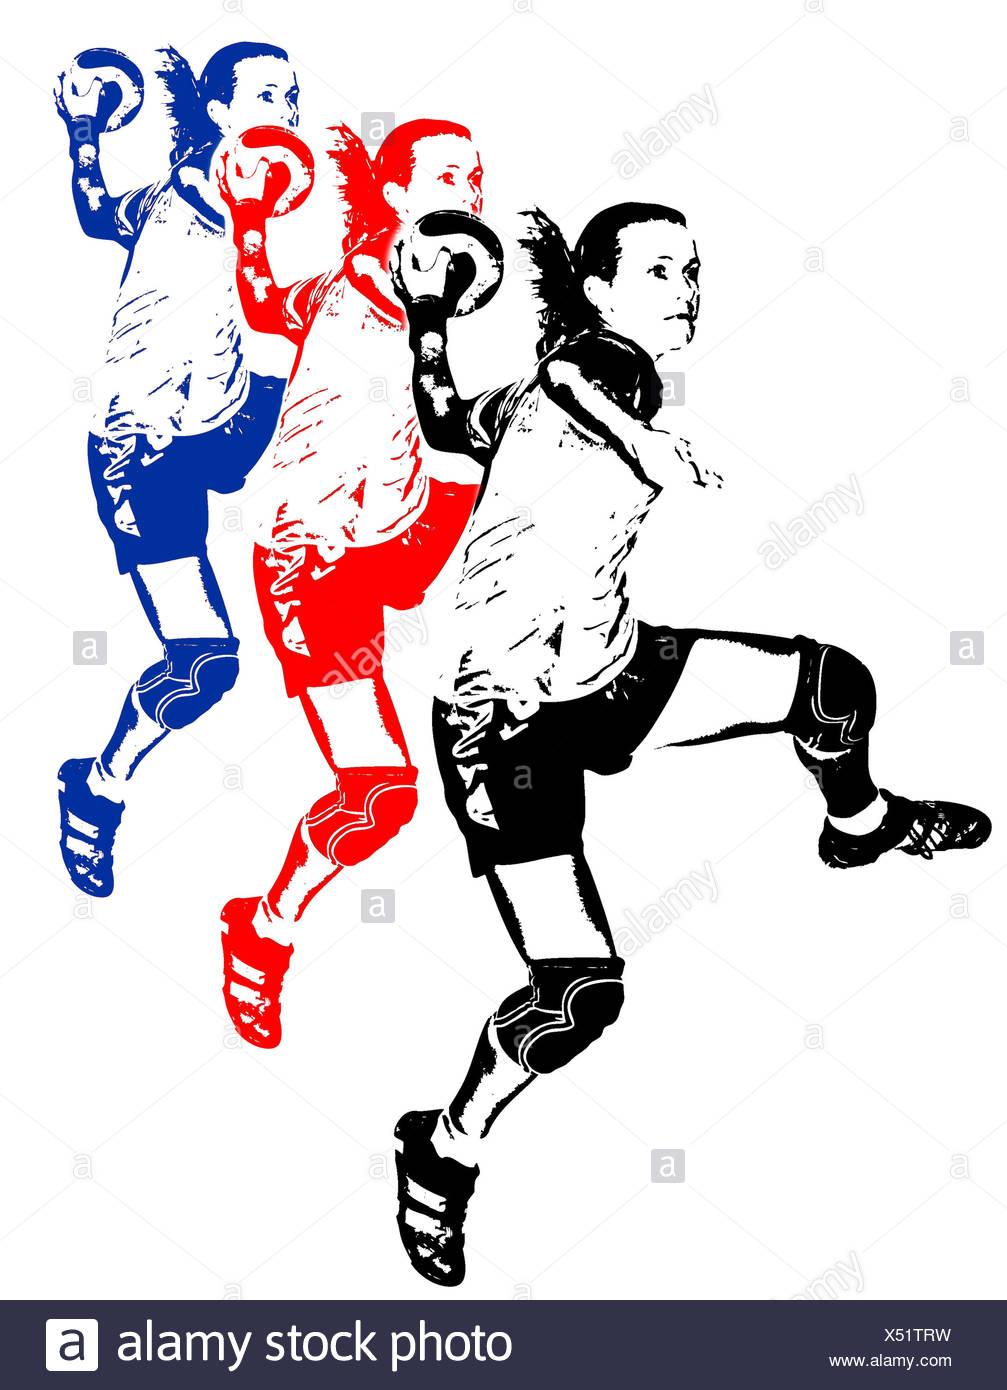 sport sports ball sport - Stock Image